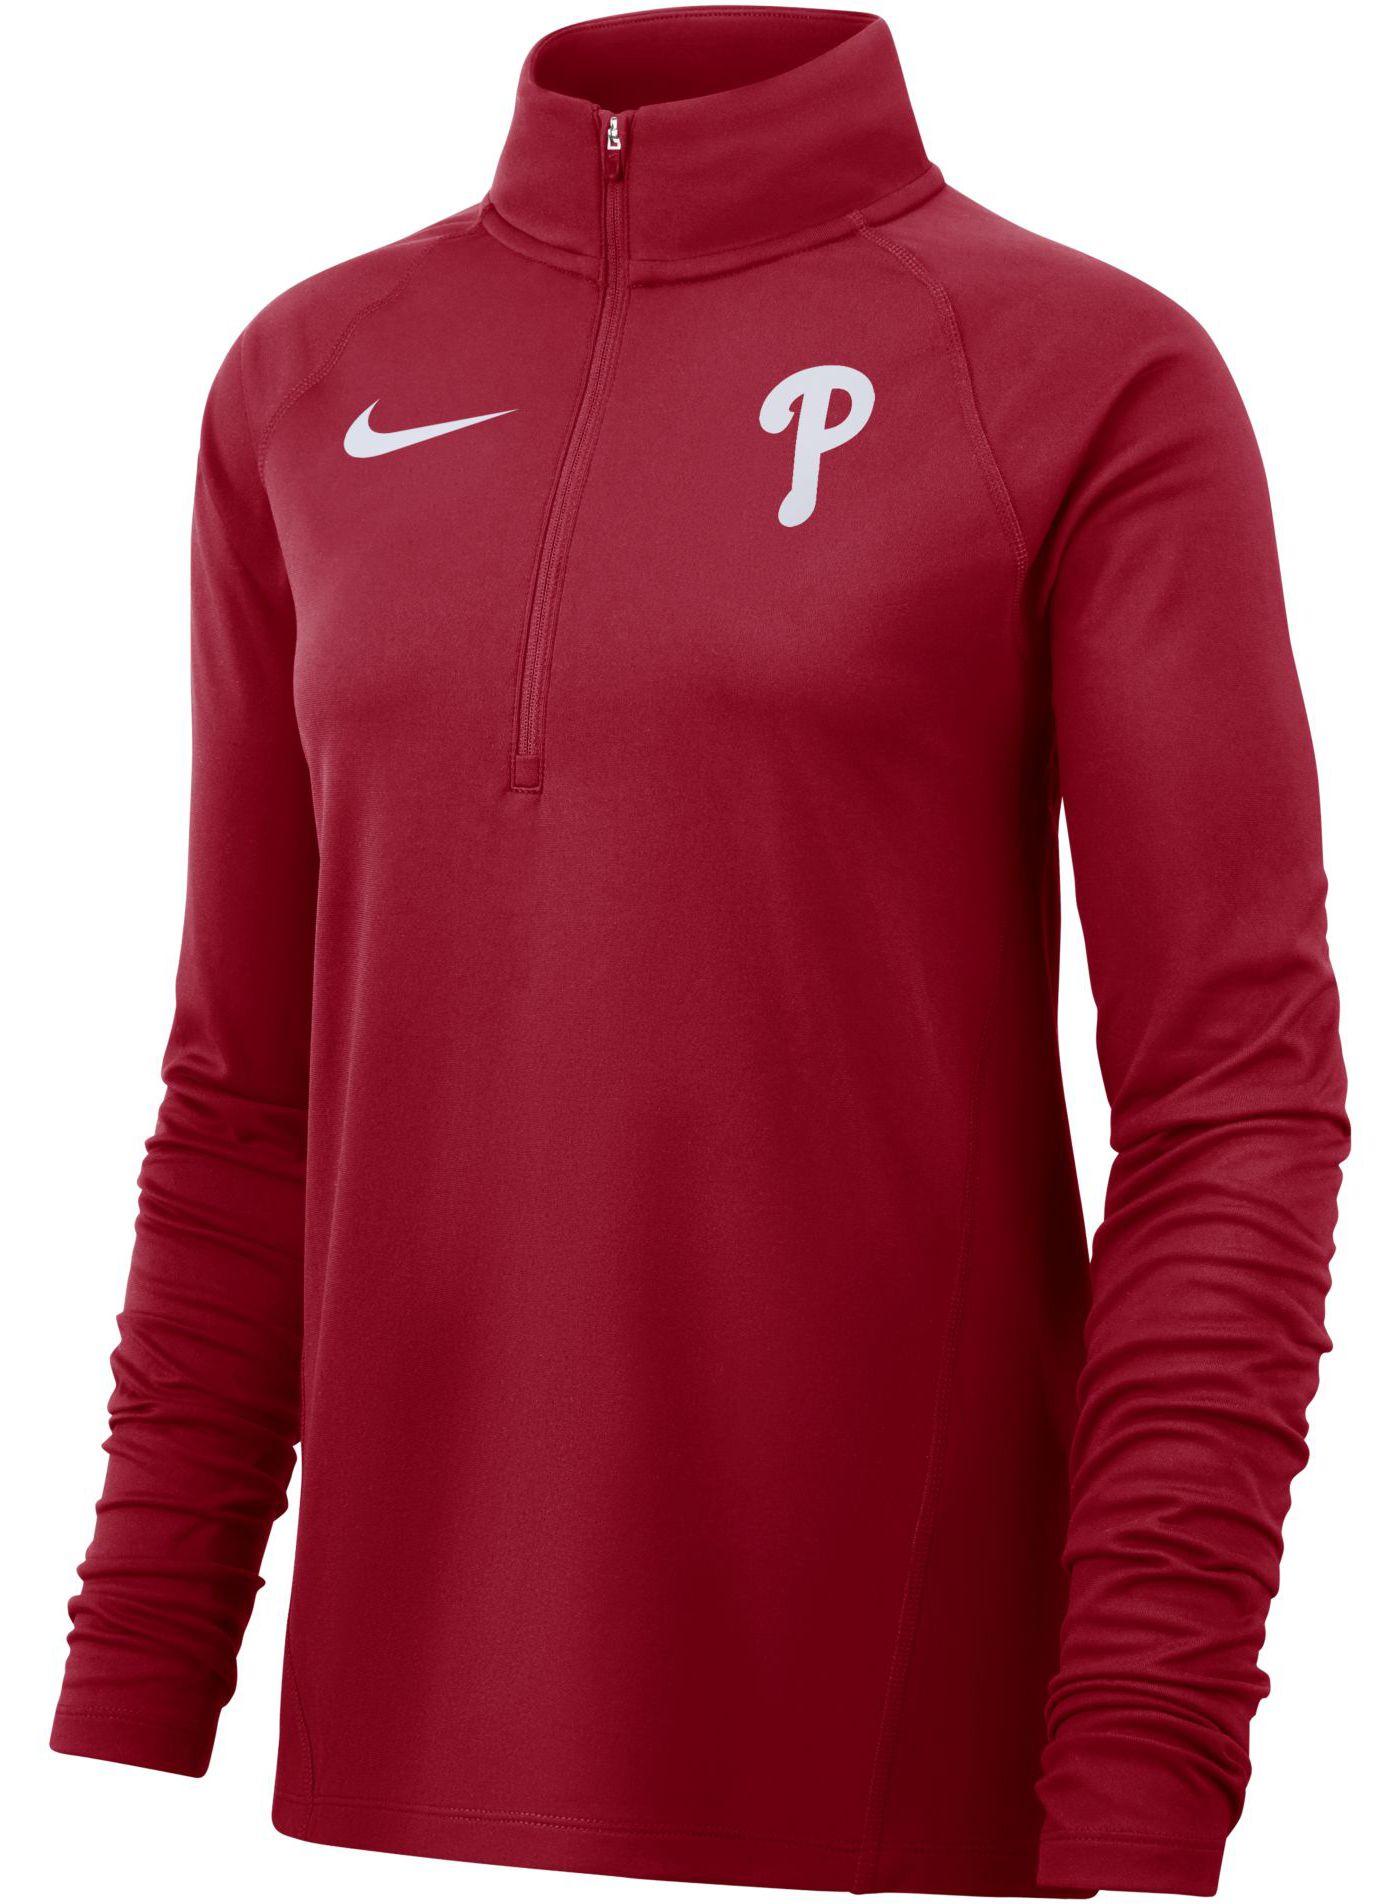 Nike Women's Philadelphia Phillies Dri-FIT Half-Zip Pullover